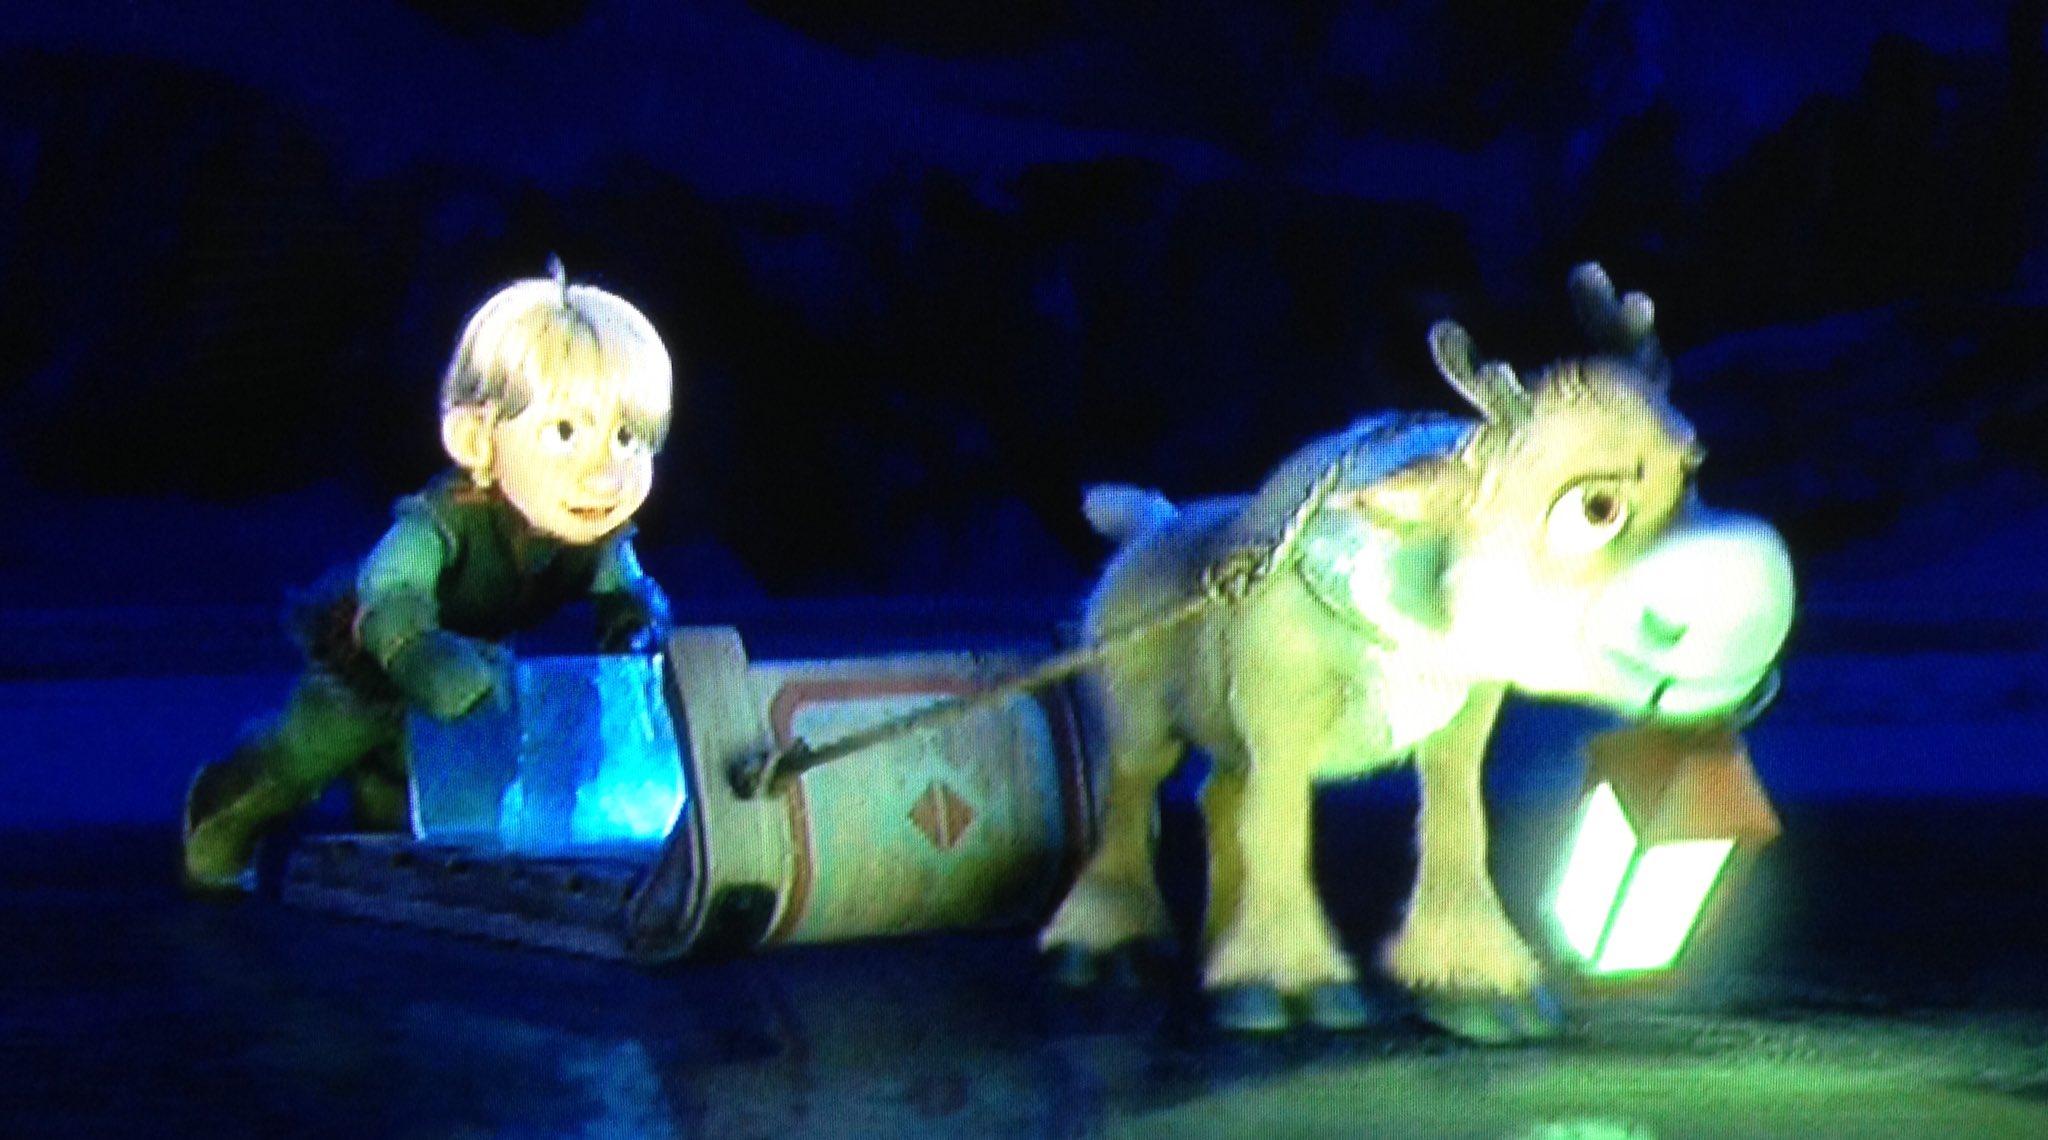 Aww! You follow your dreams right into the sun, kiddos. #Frozen https://t.co/JXrWr9aiYE